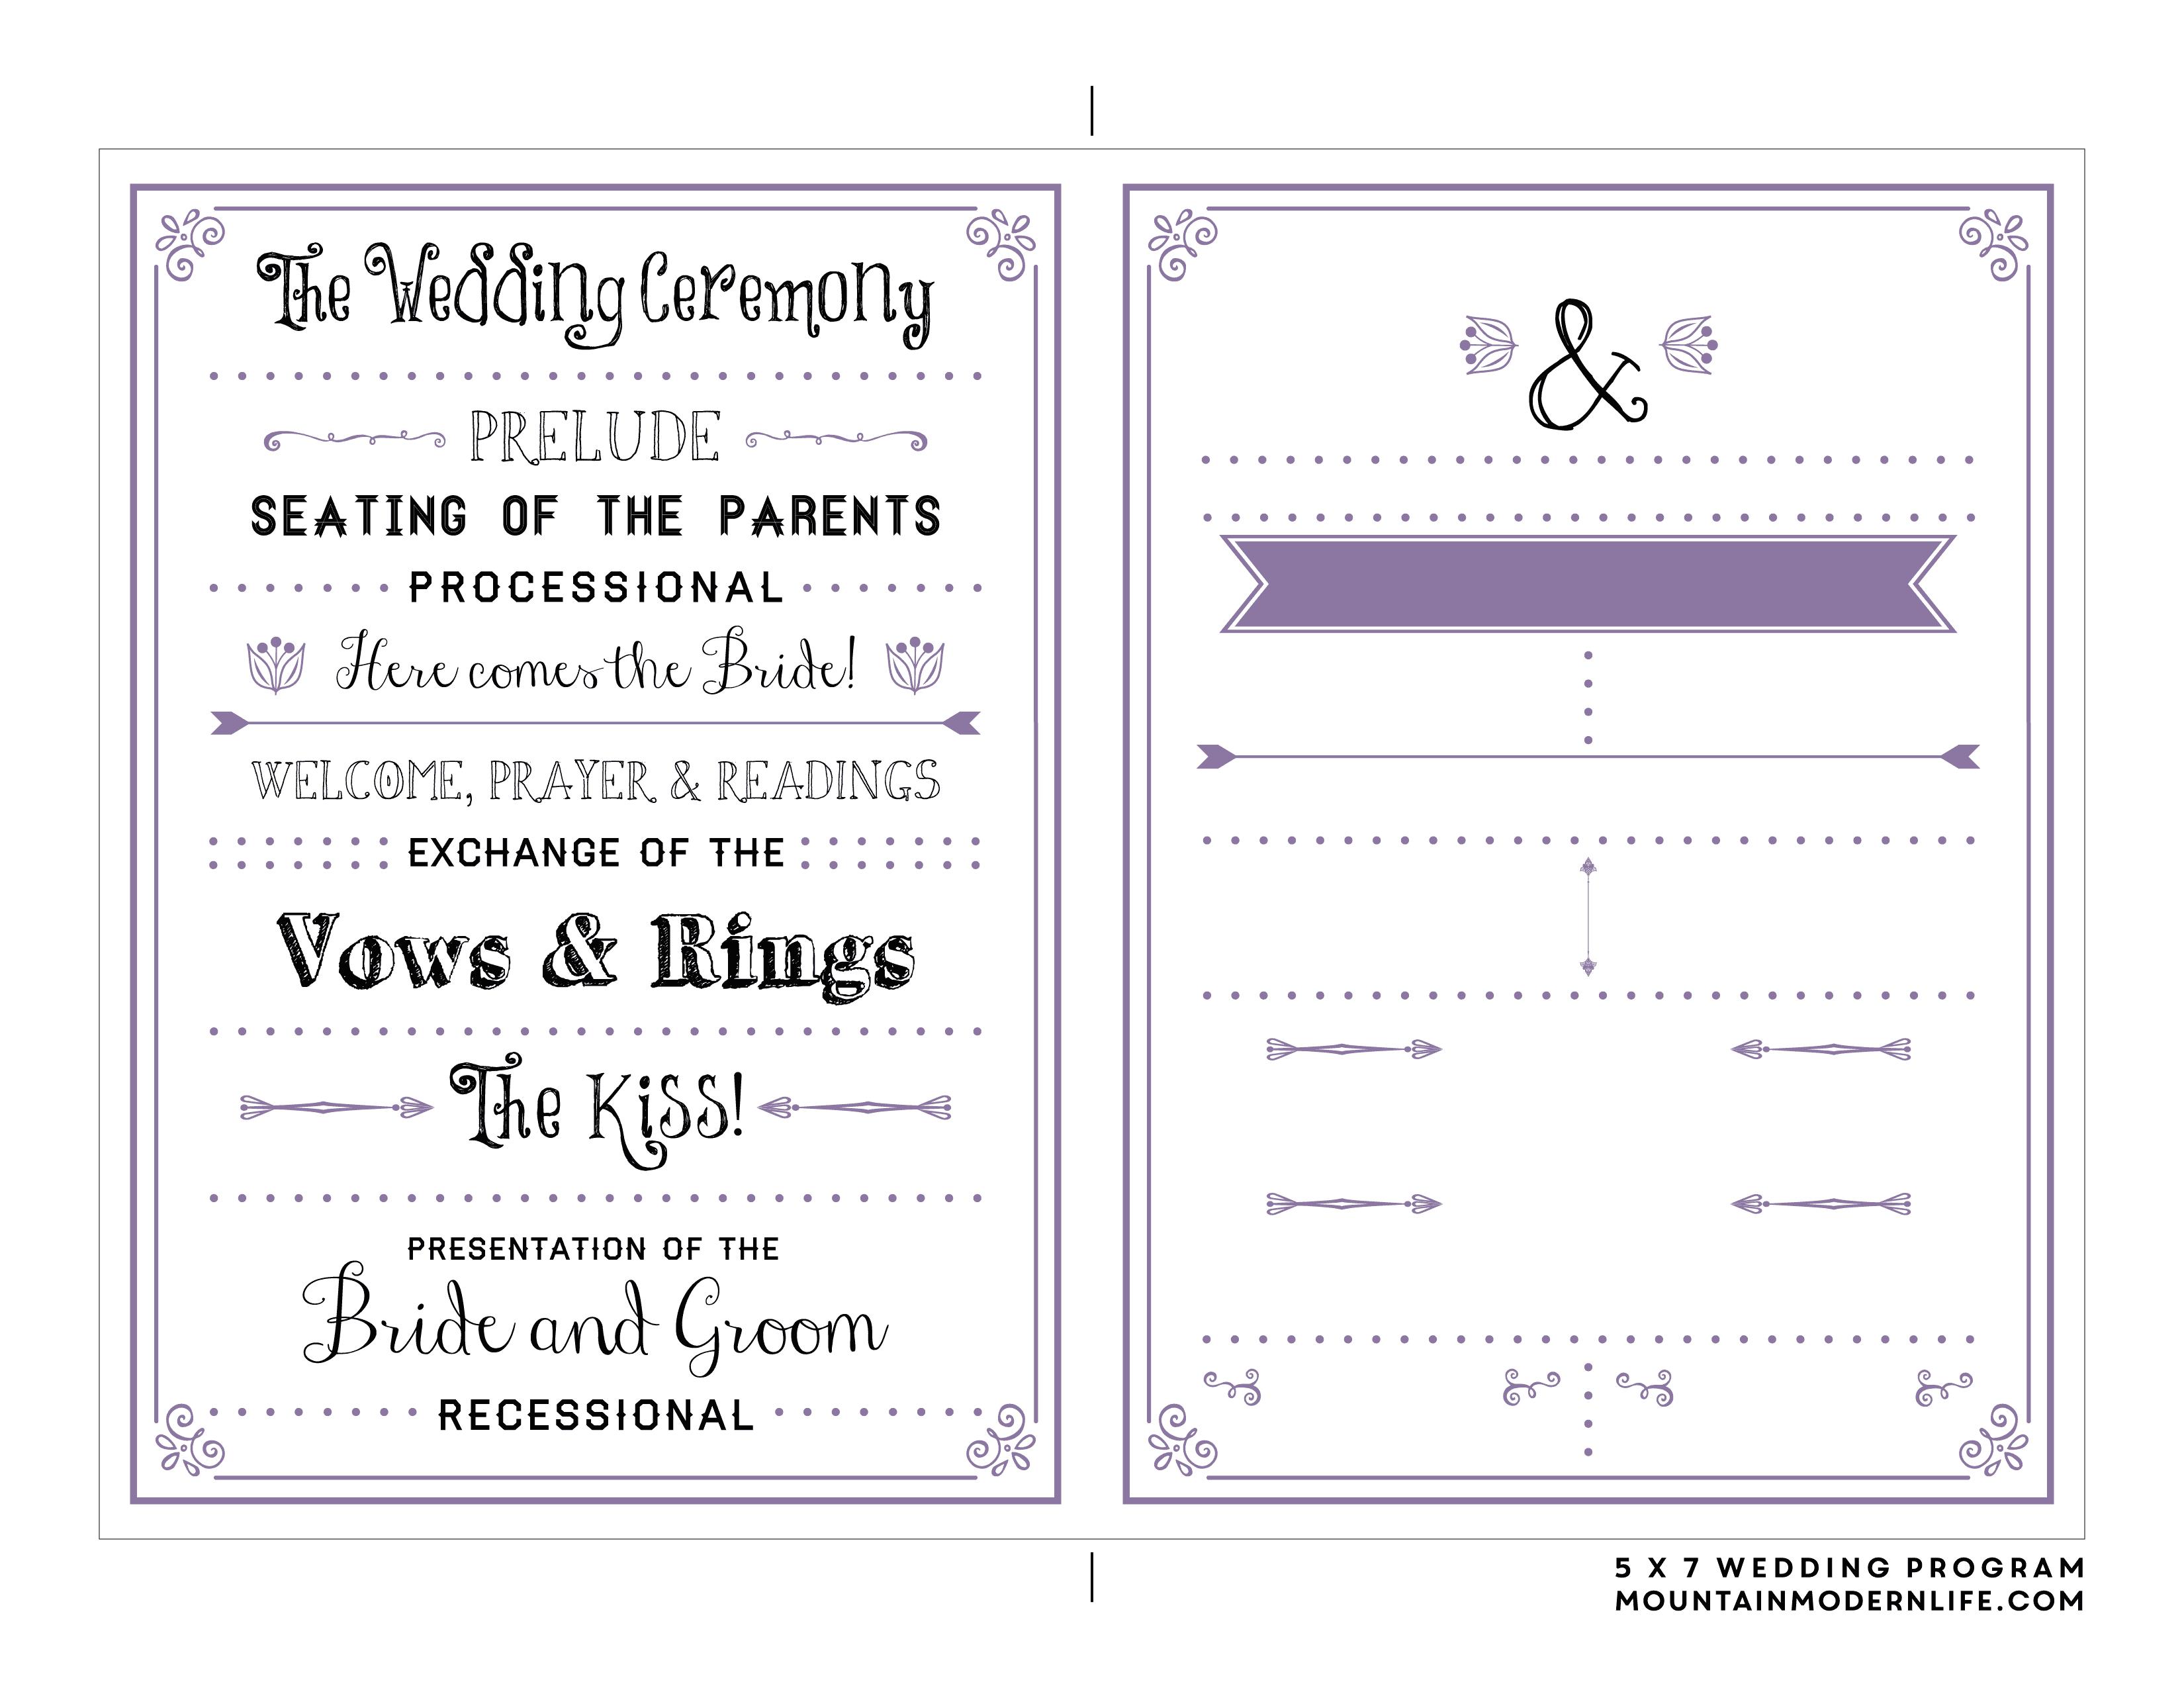 Free Printable Wedding Program   Mountainmodernlife - Free Printable Fan Wedding Programs